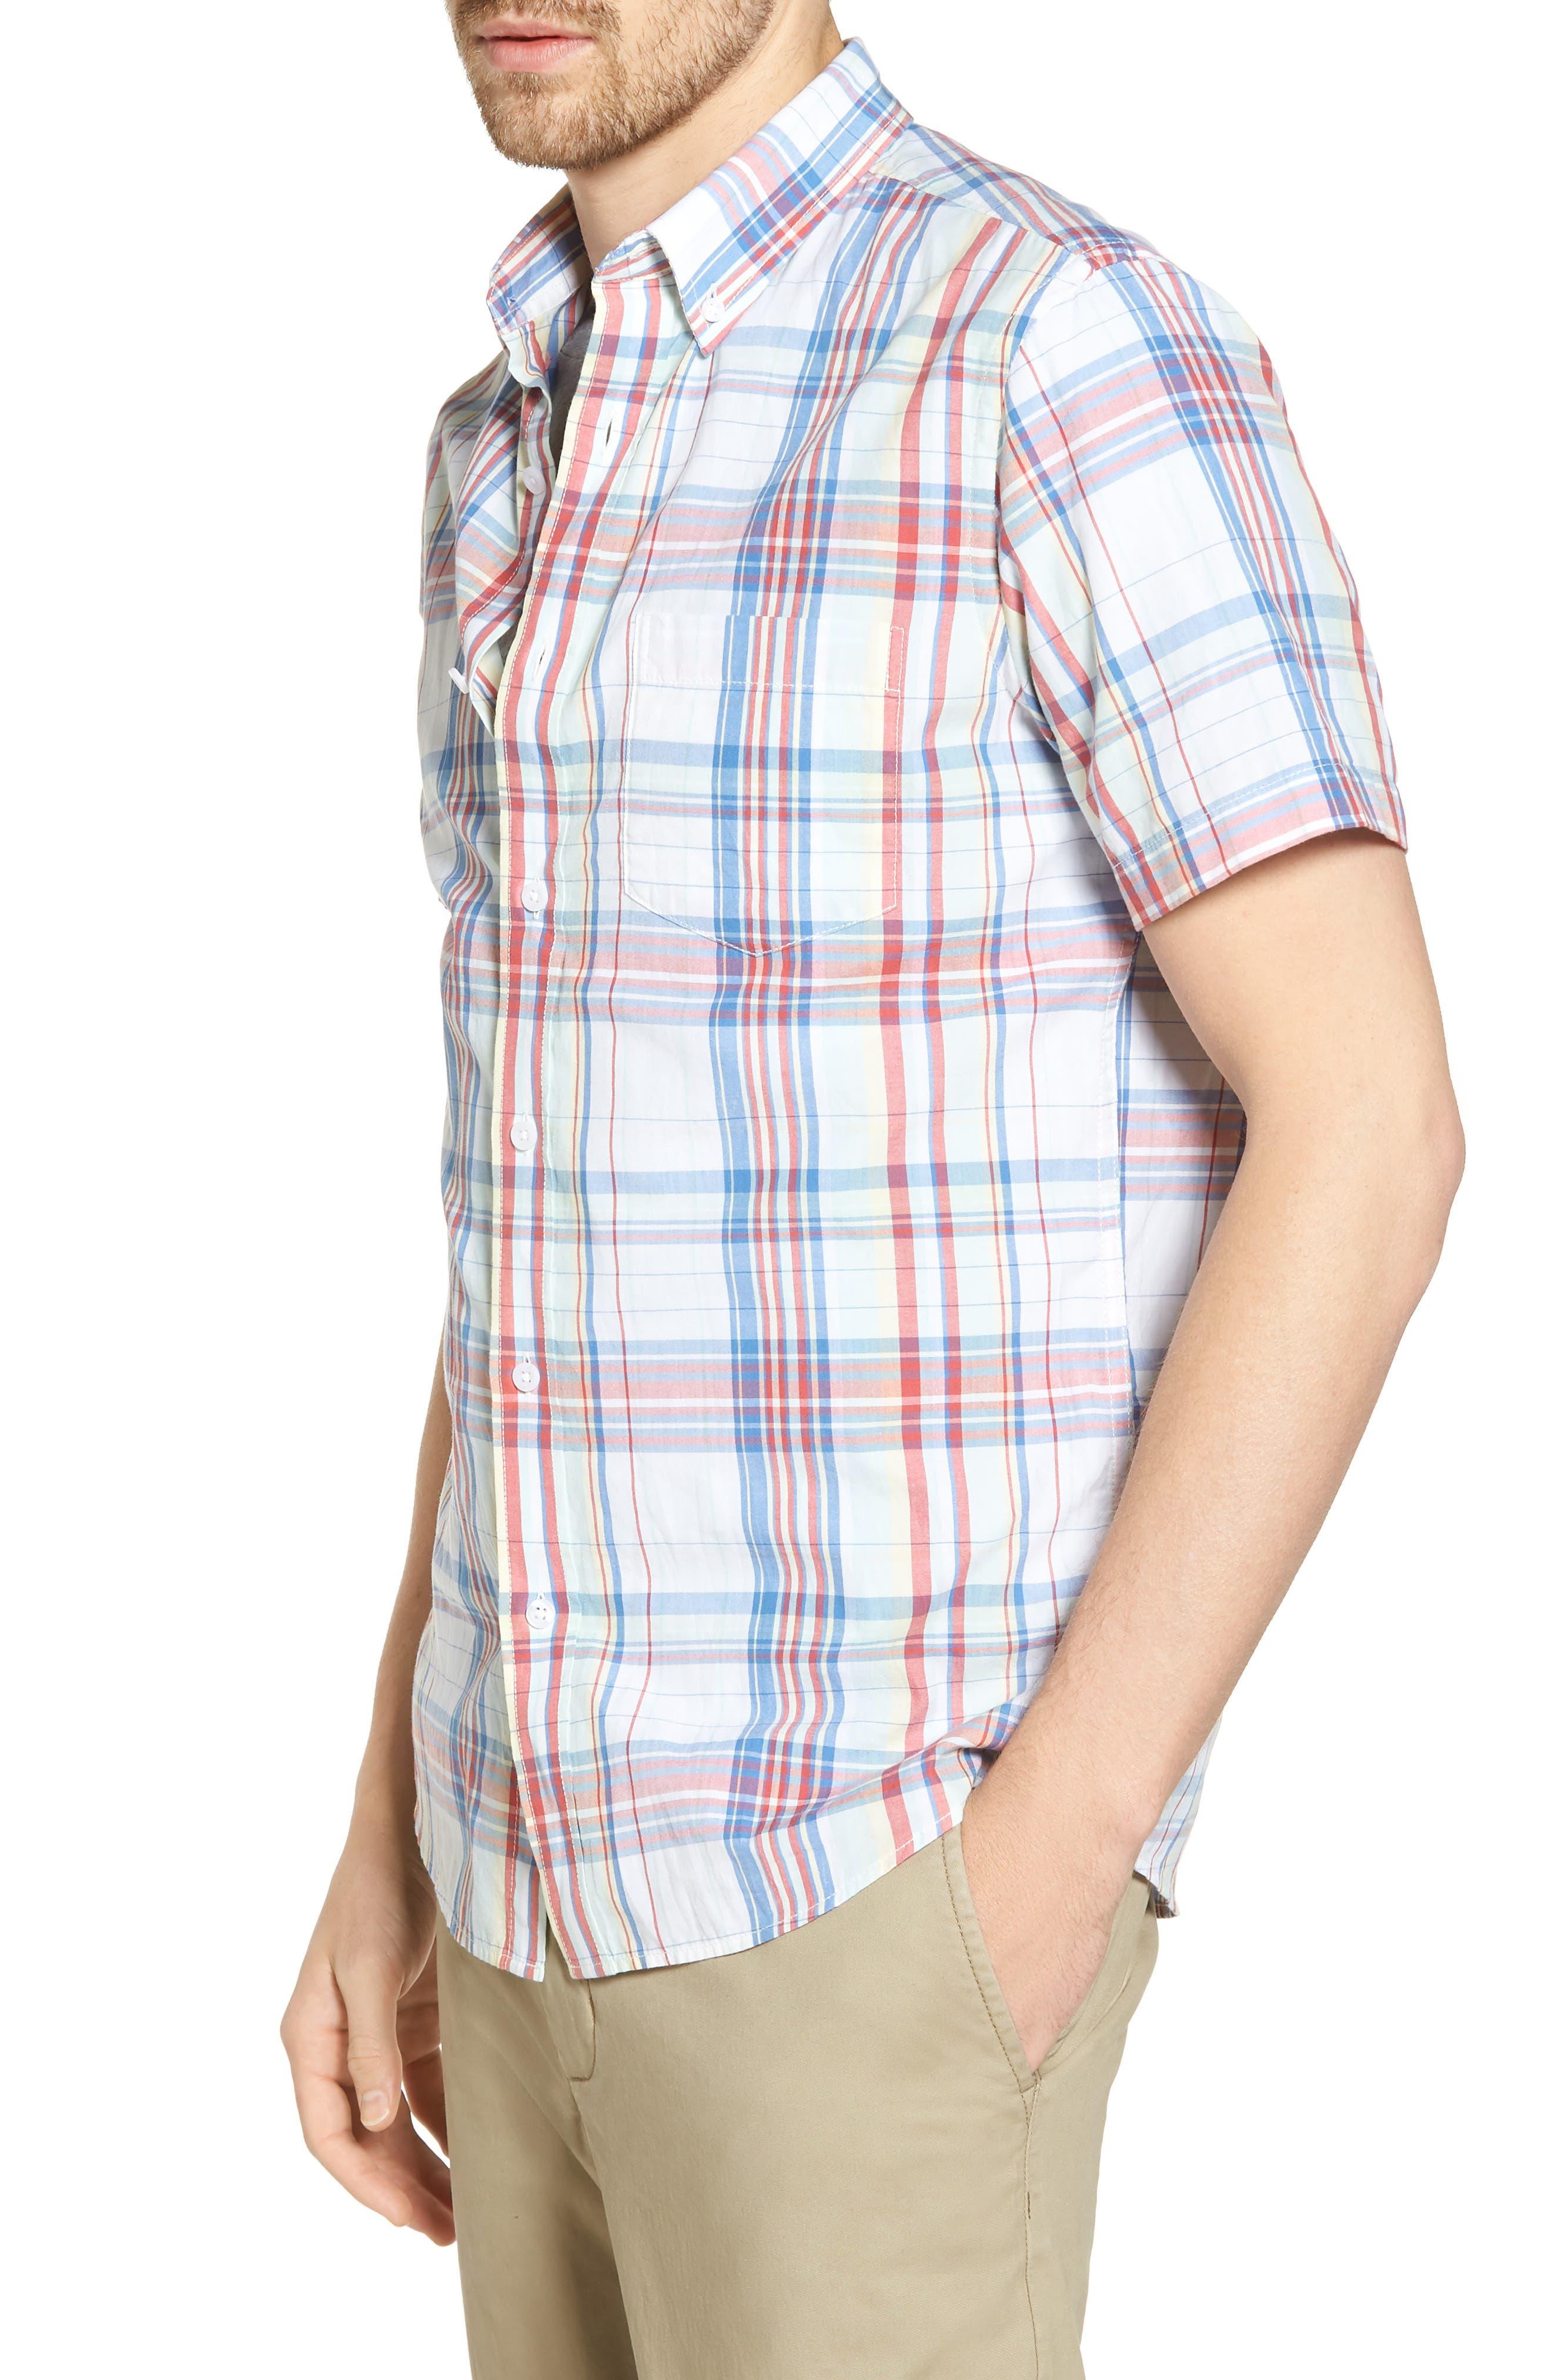 Trim Fit Plaid Short Sleeve Sport Shirt,                             Alternate thumbnail 4, color,                             White Red Multi Plaid